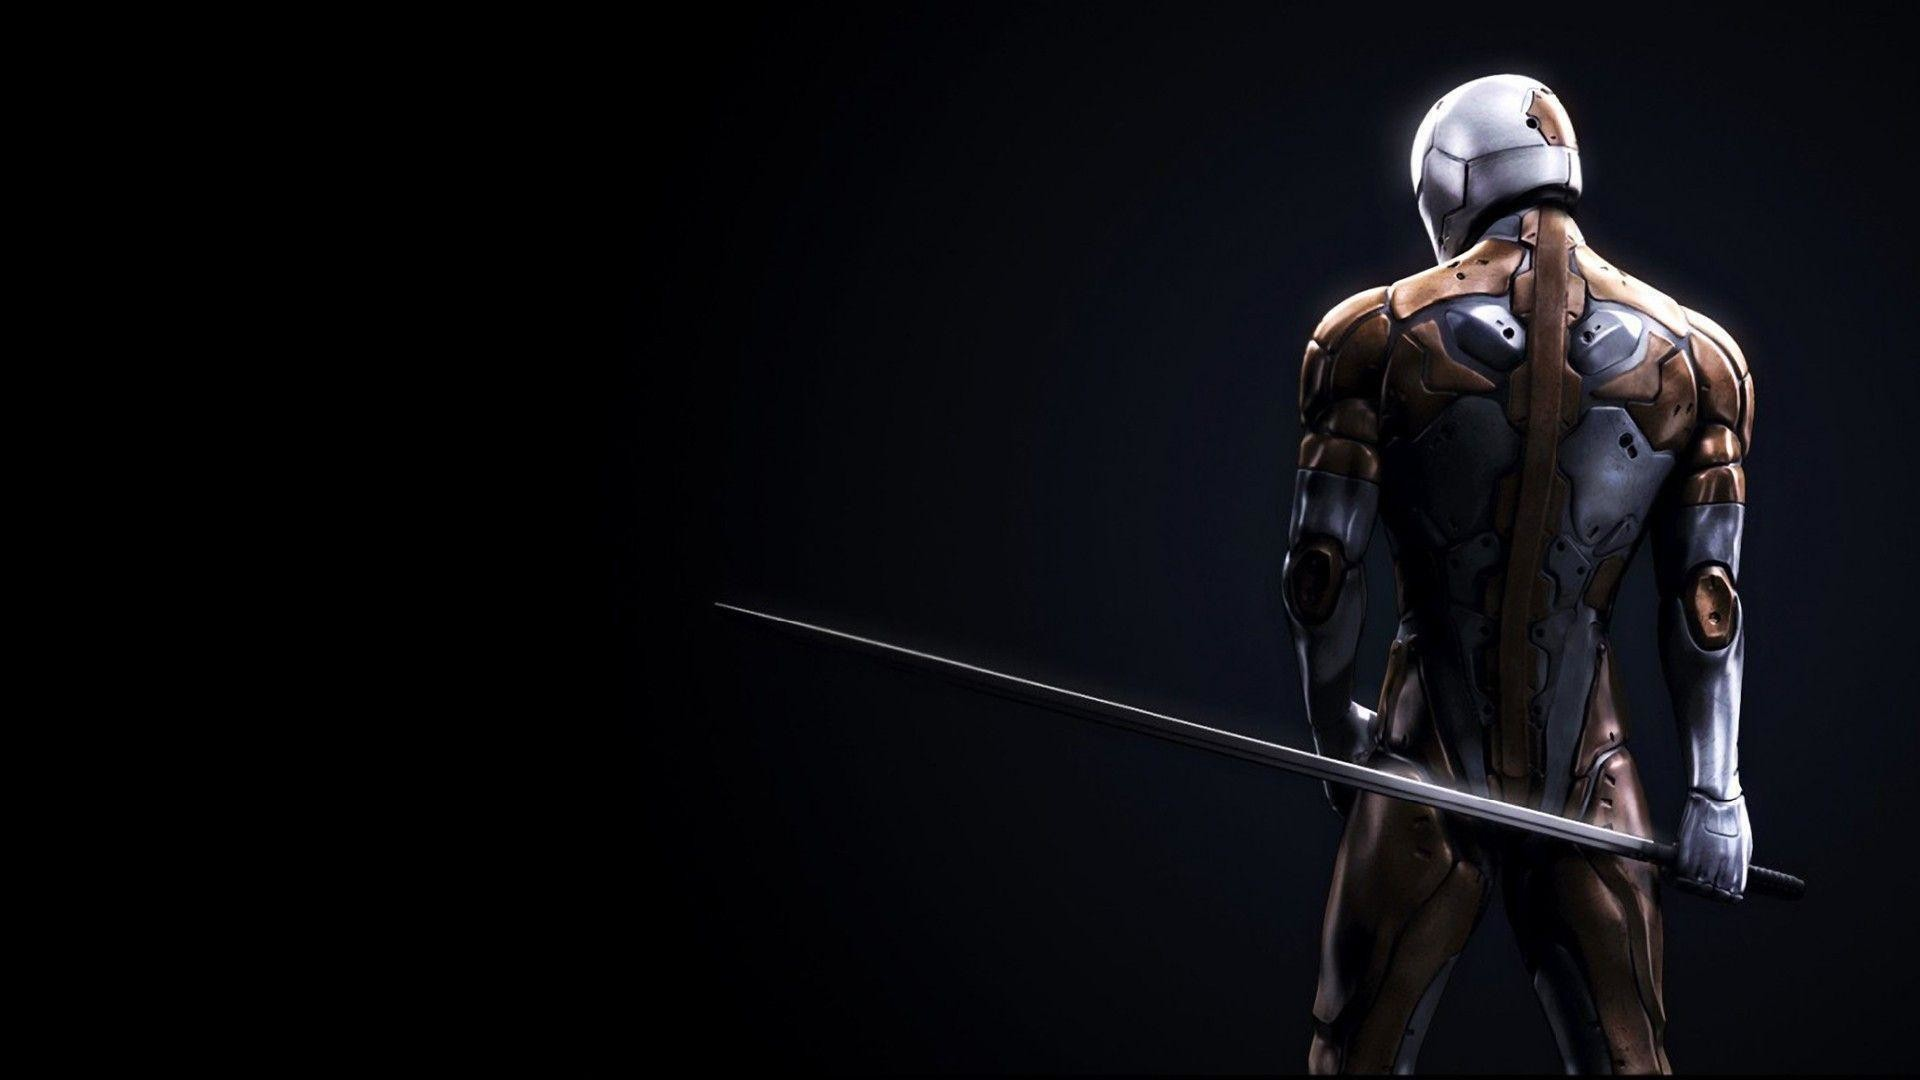 161 Metal Gear Solid Wallpapers